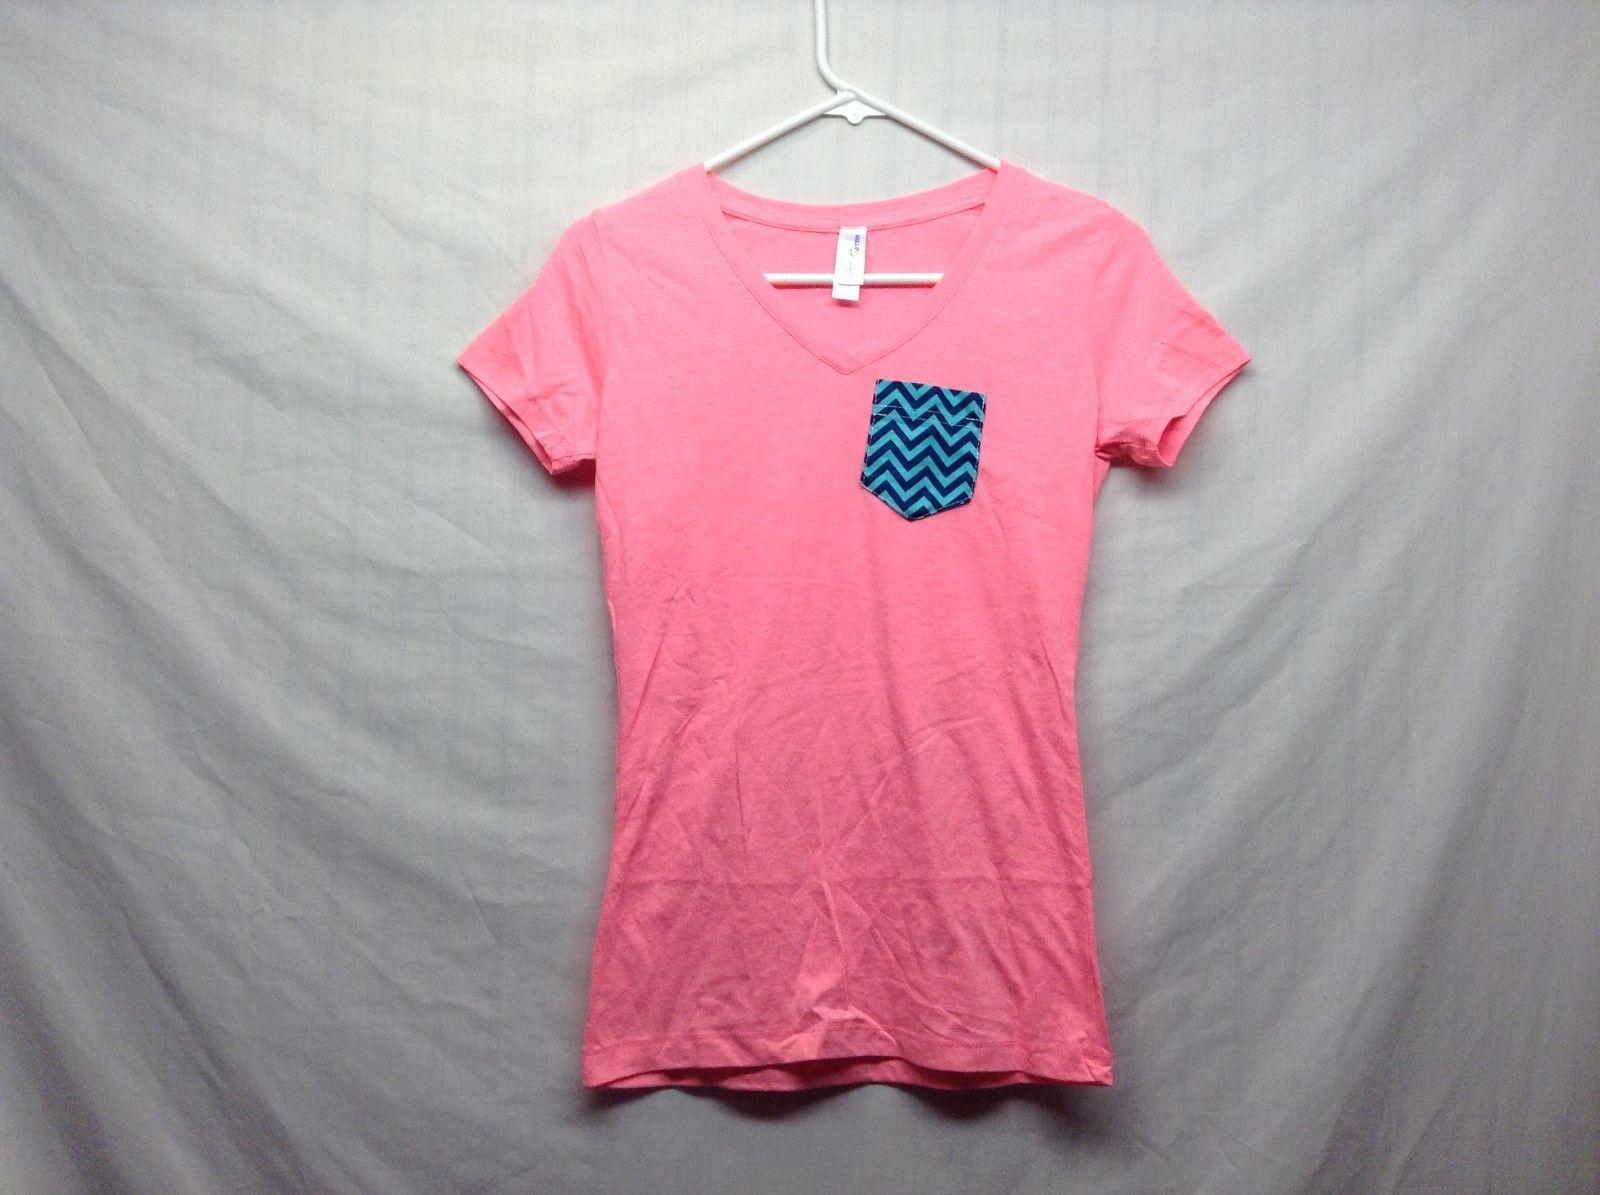 NEW Women's Indigo Cotton Pink V Neck Casual Shirt Sz S